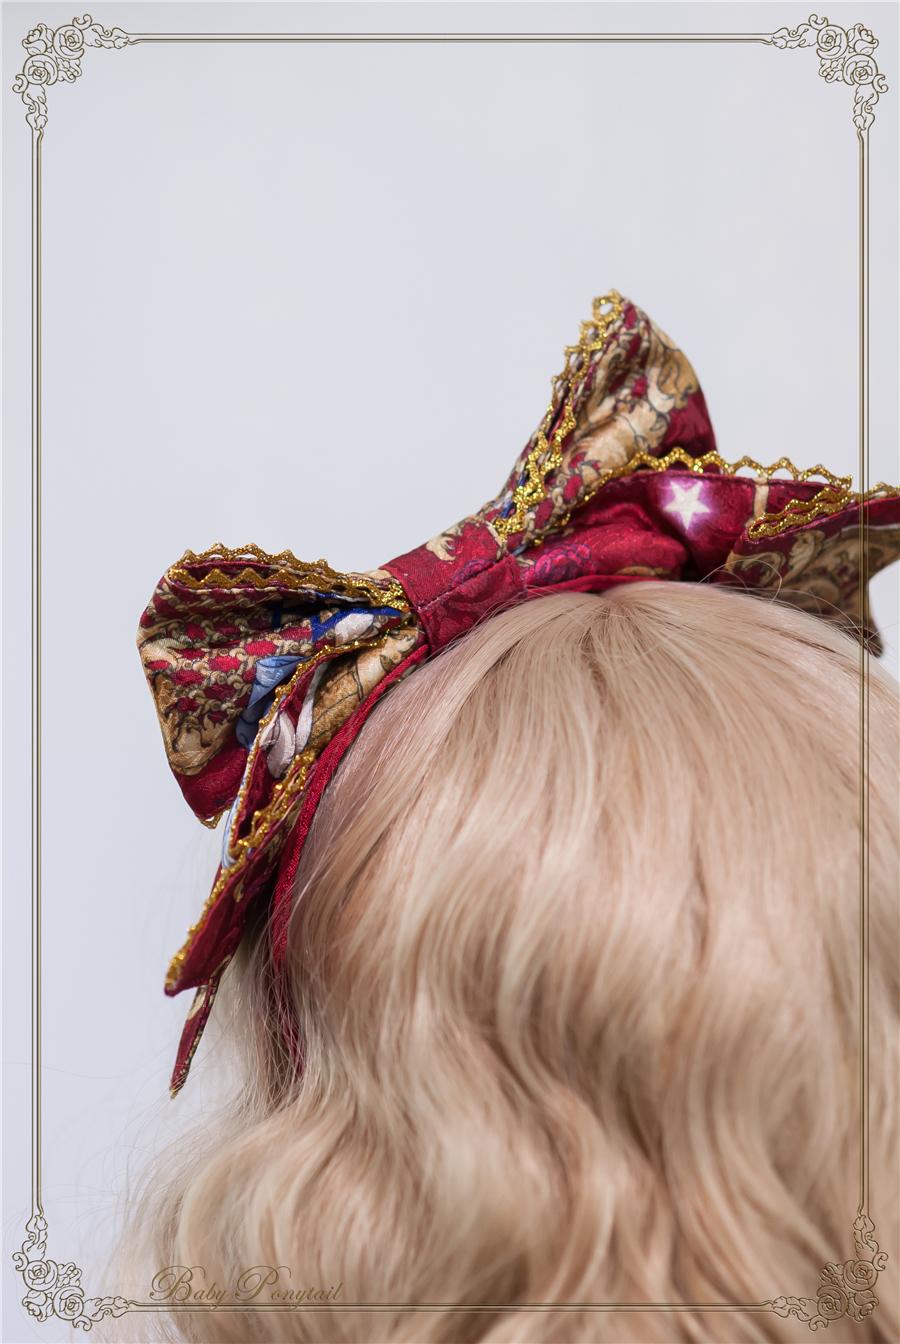 Baby Ponytail_Stock photo_Circus Princess_KC Red_05.jpg